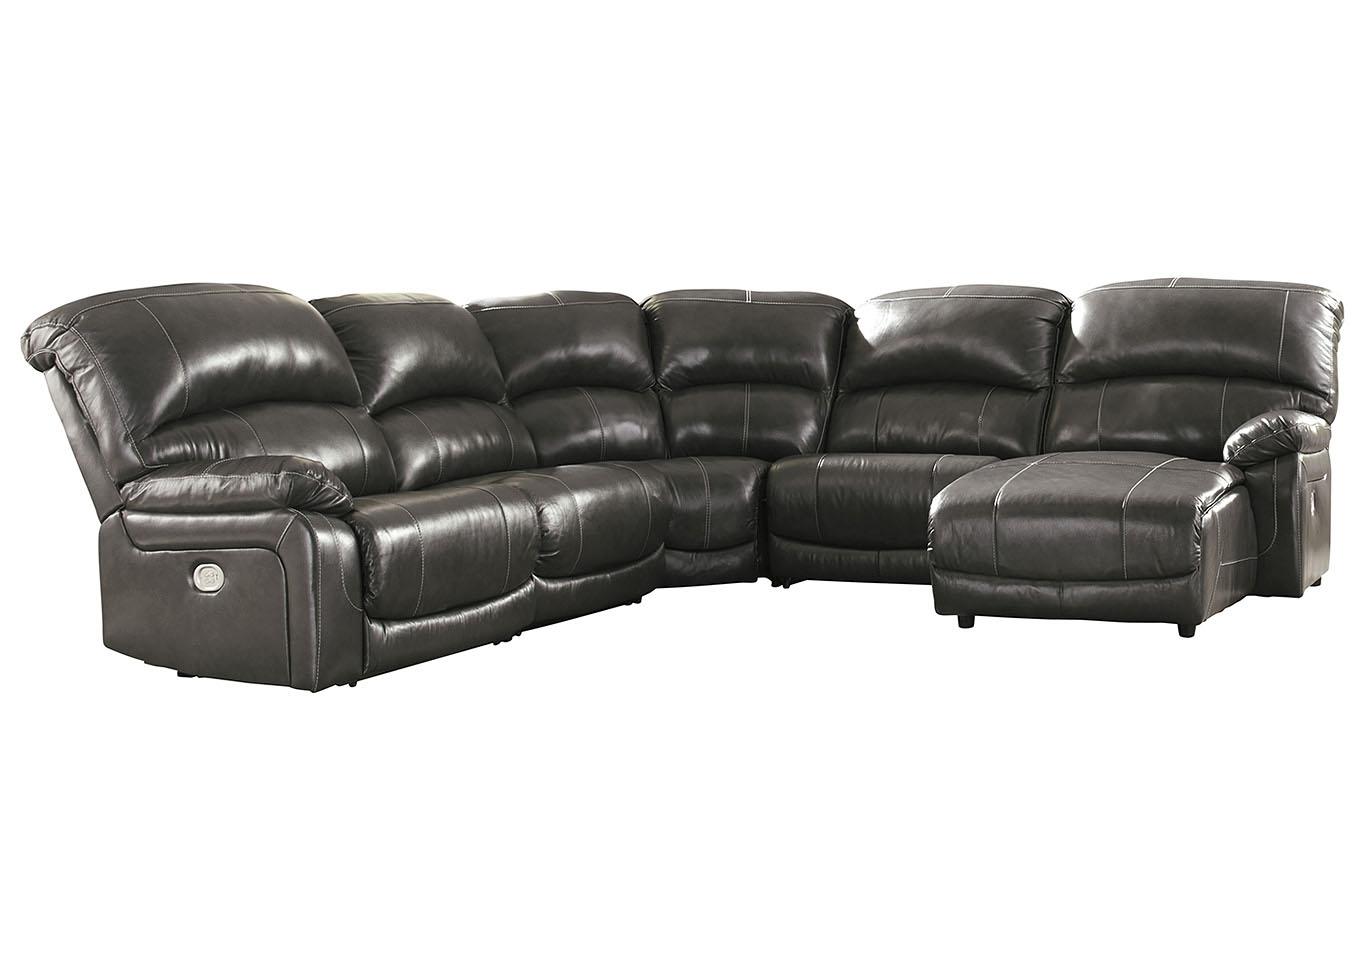 Astounding Austins Couch Potatoes Furniture Stores Austin Texas Uwap Interior Chair Design Uwaporg